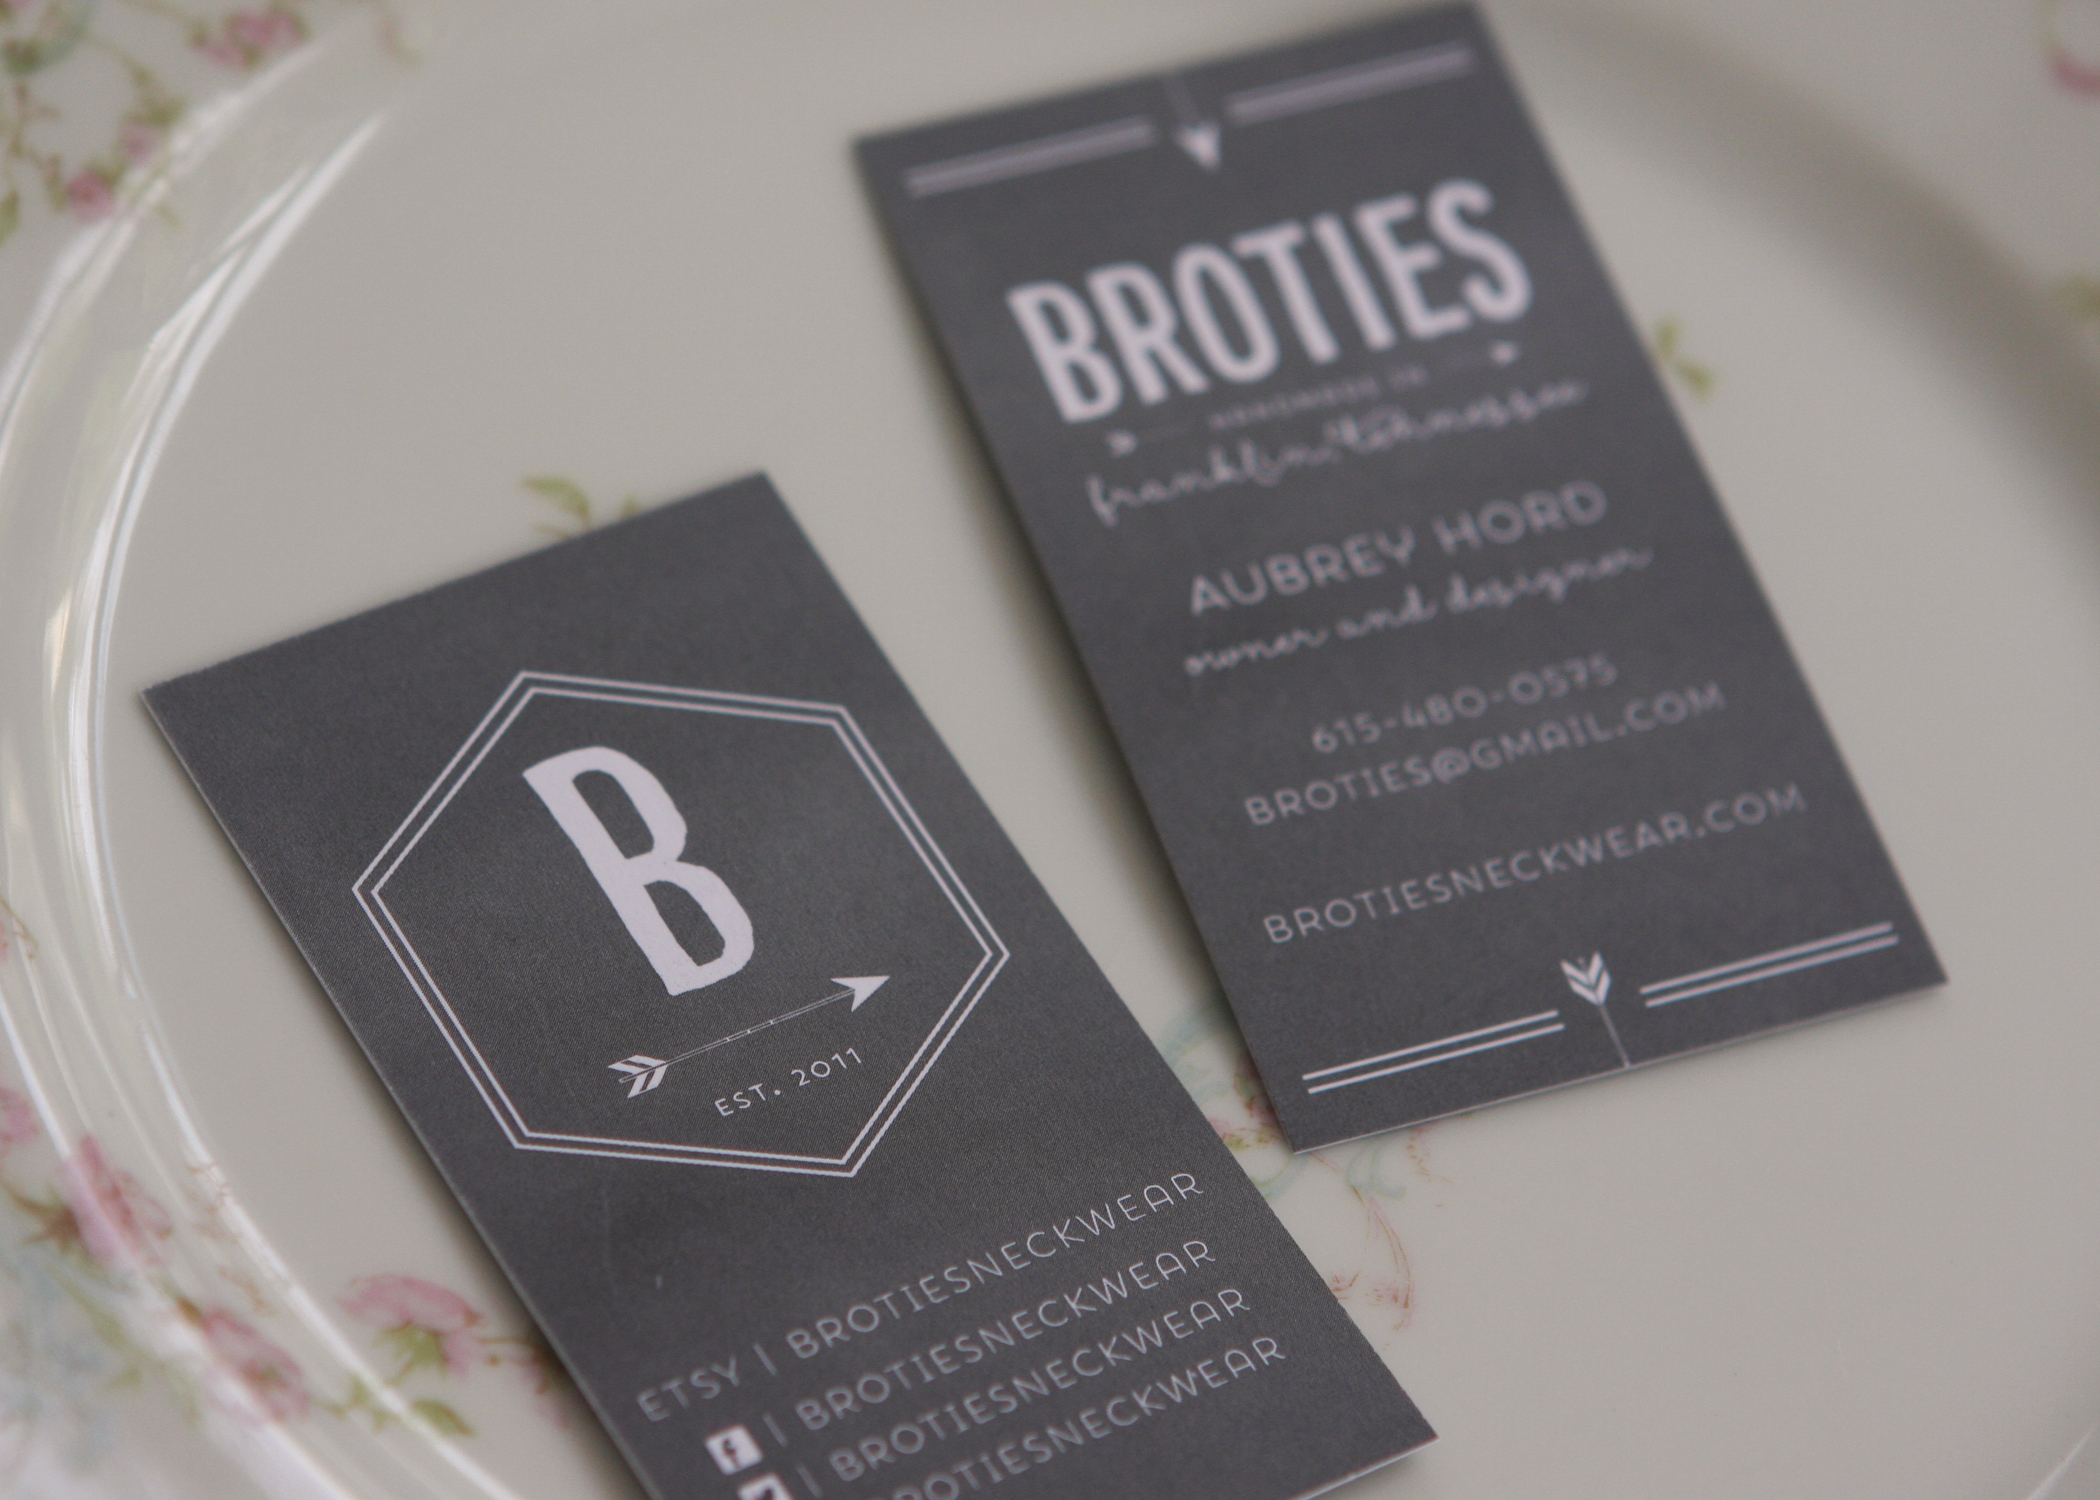 brotiesbusinesscards